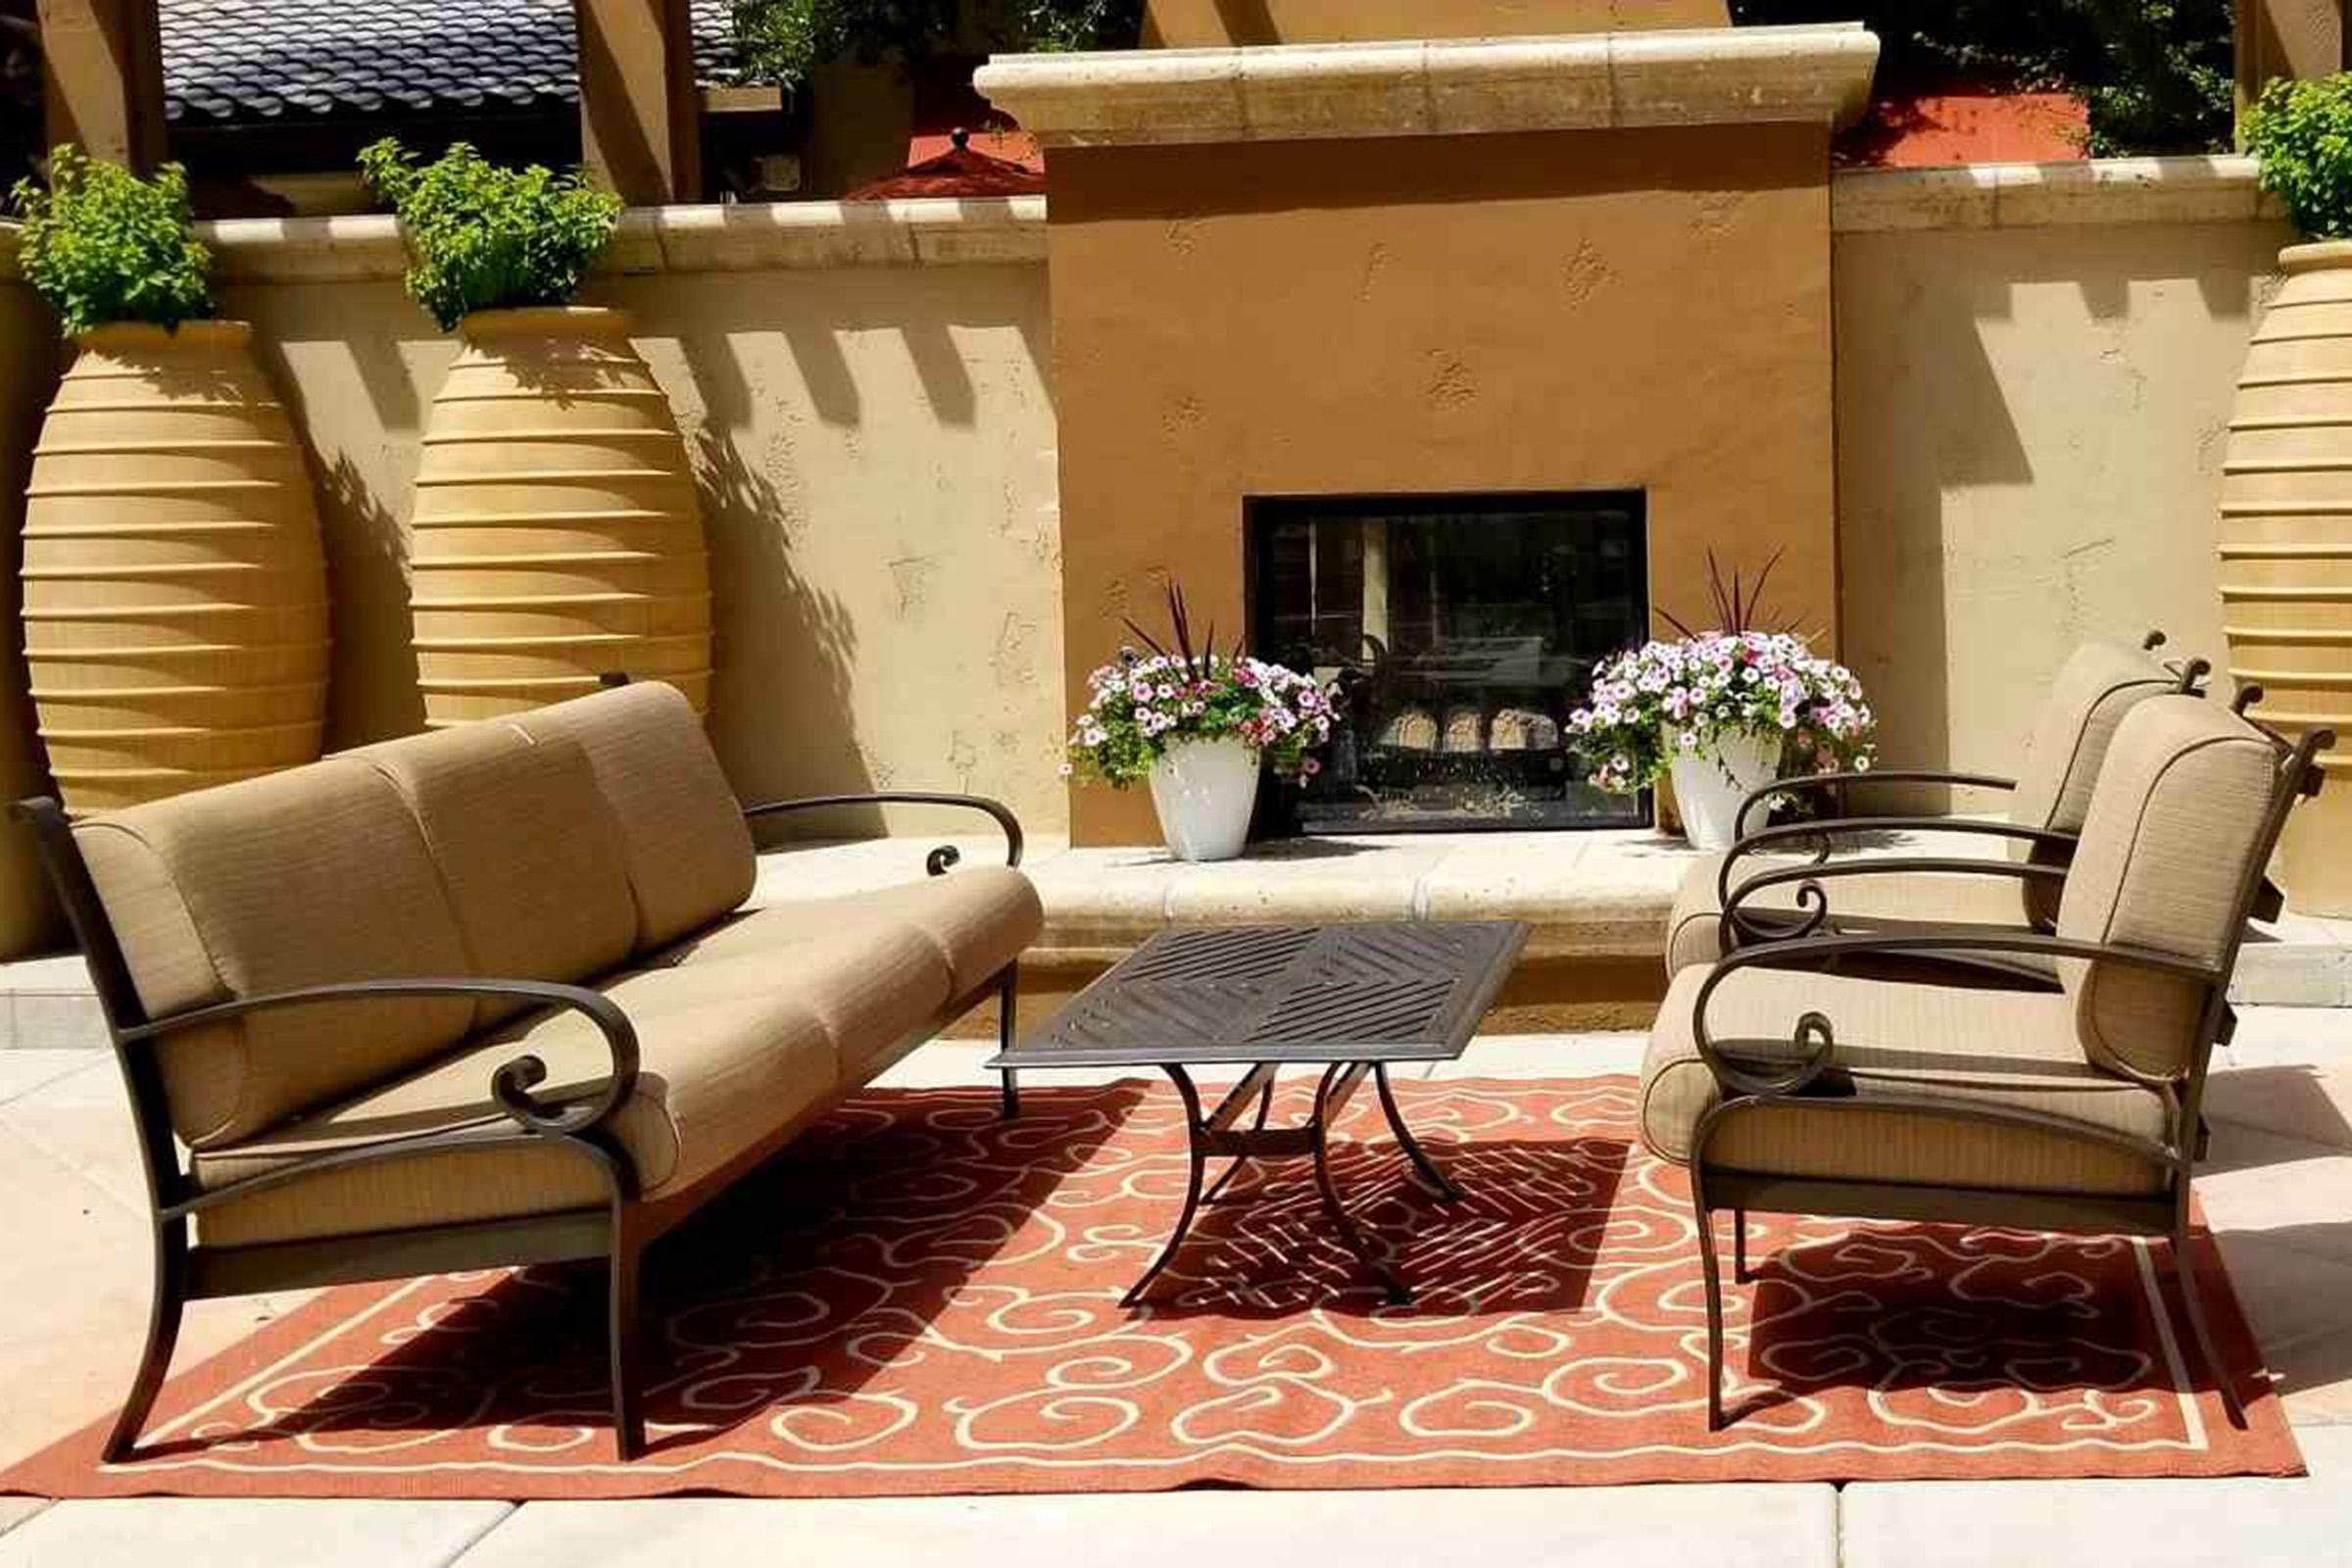 a chair in a garden